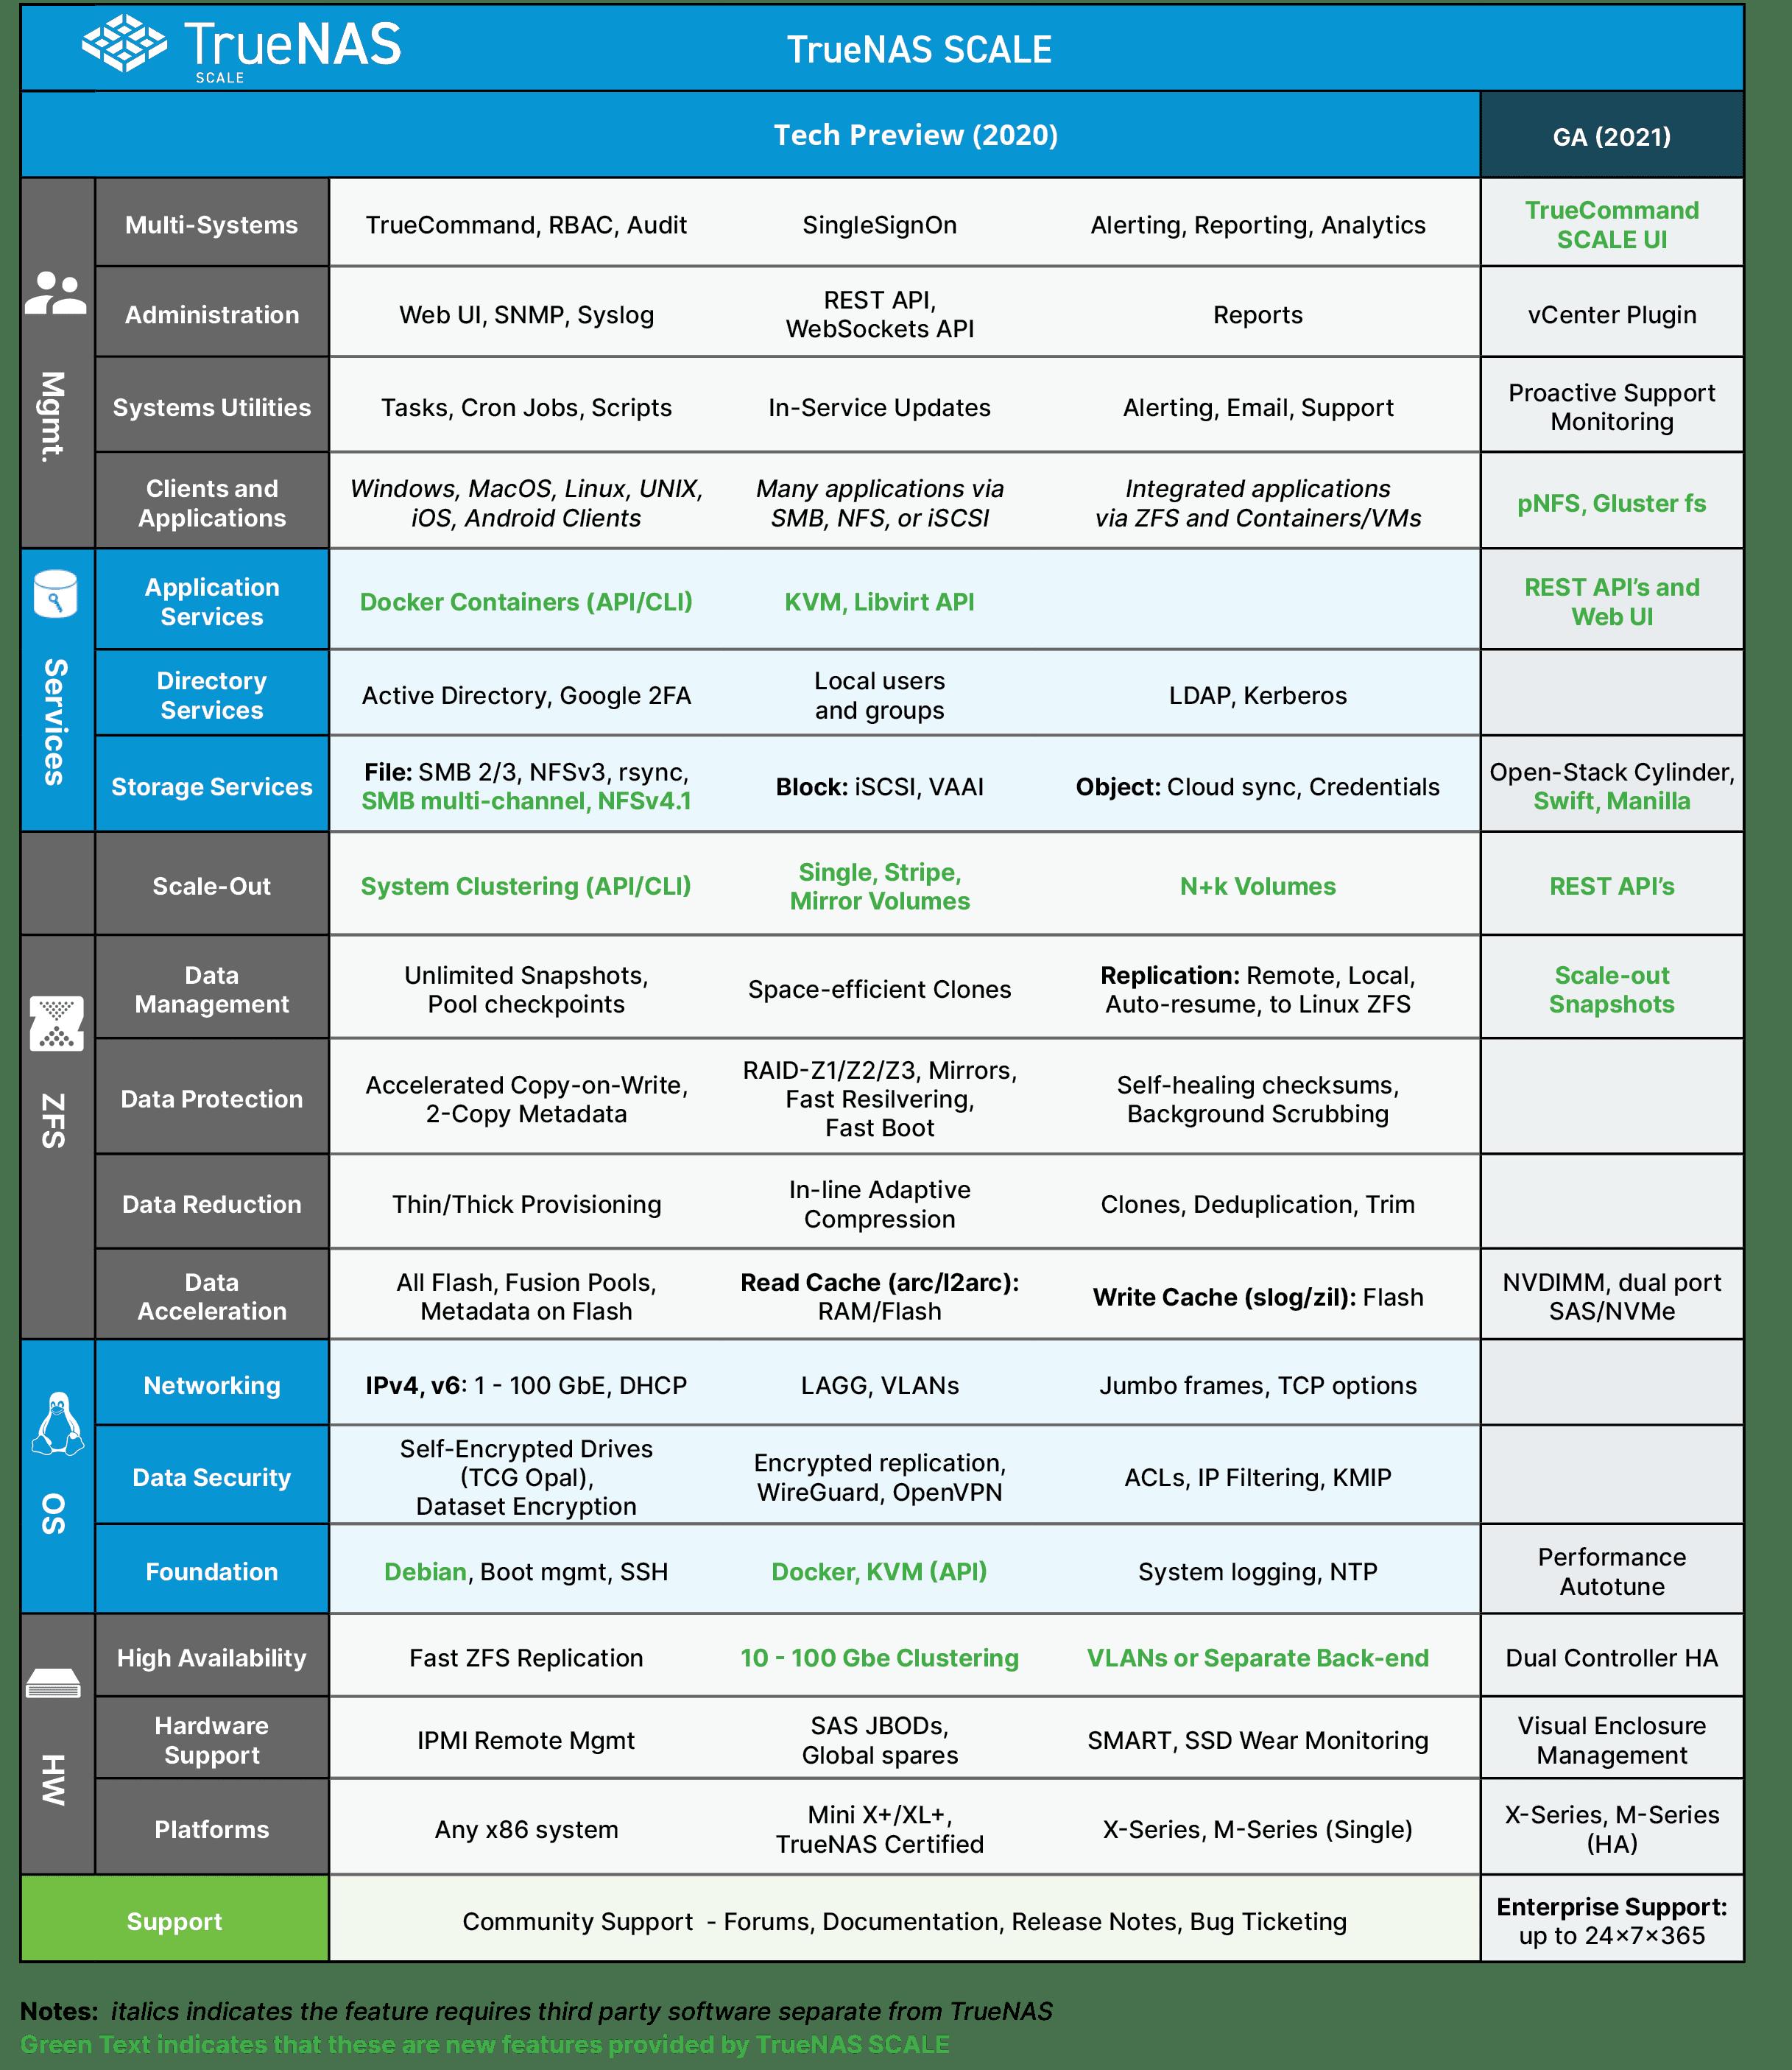 TrueNAS SCALE Software Features DataSheet